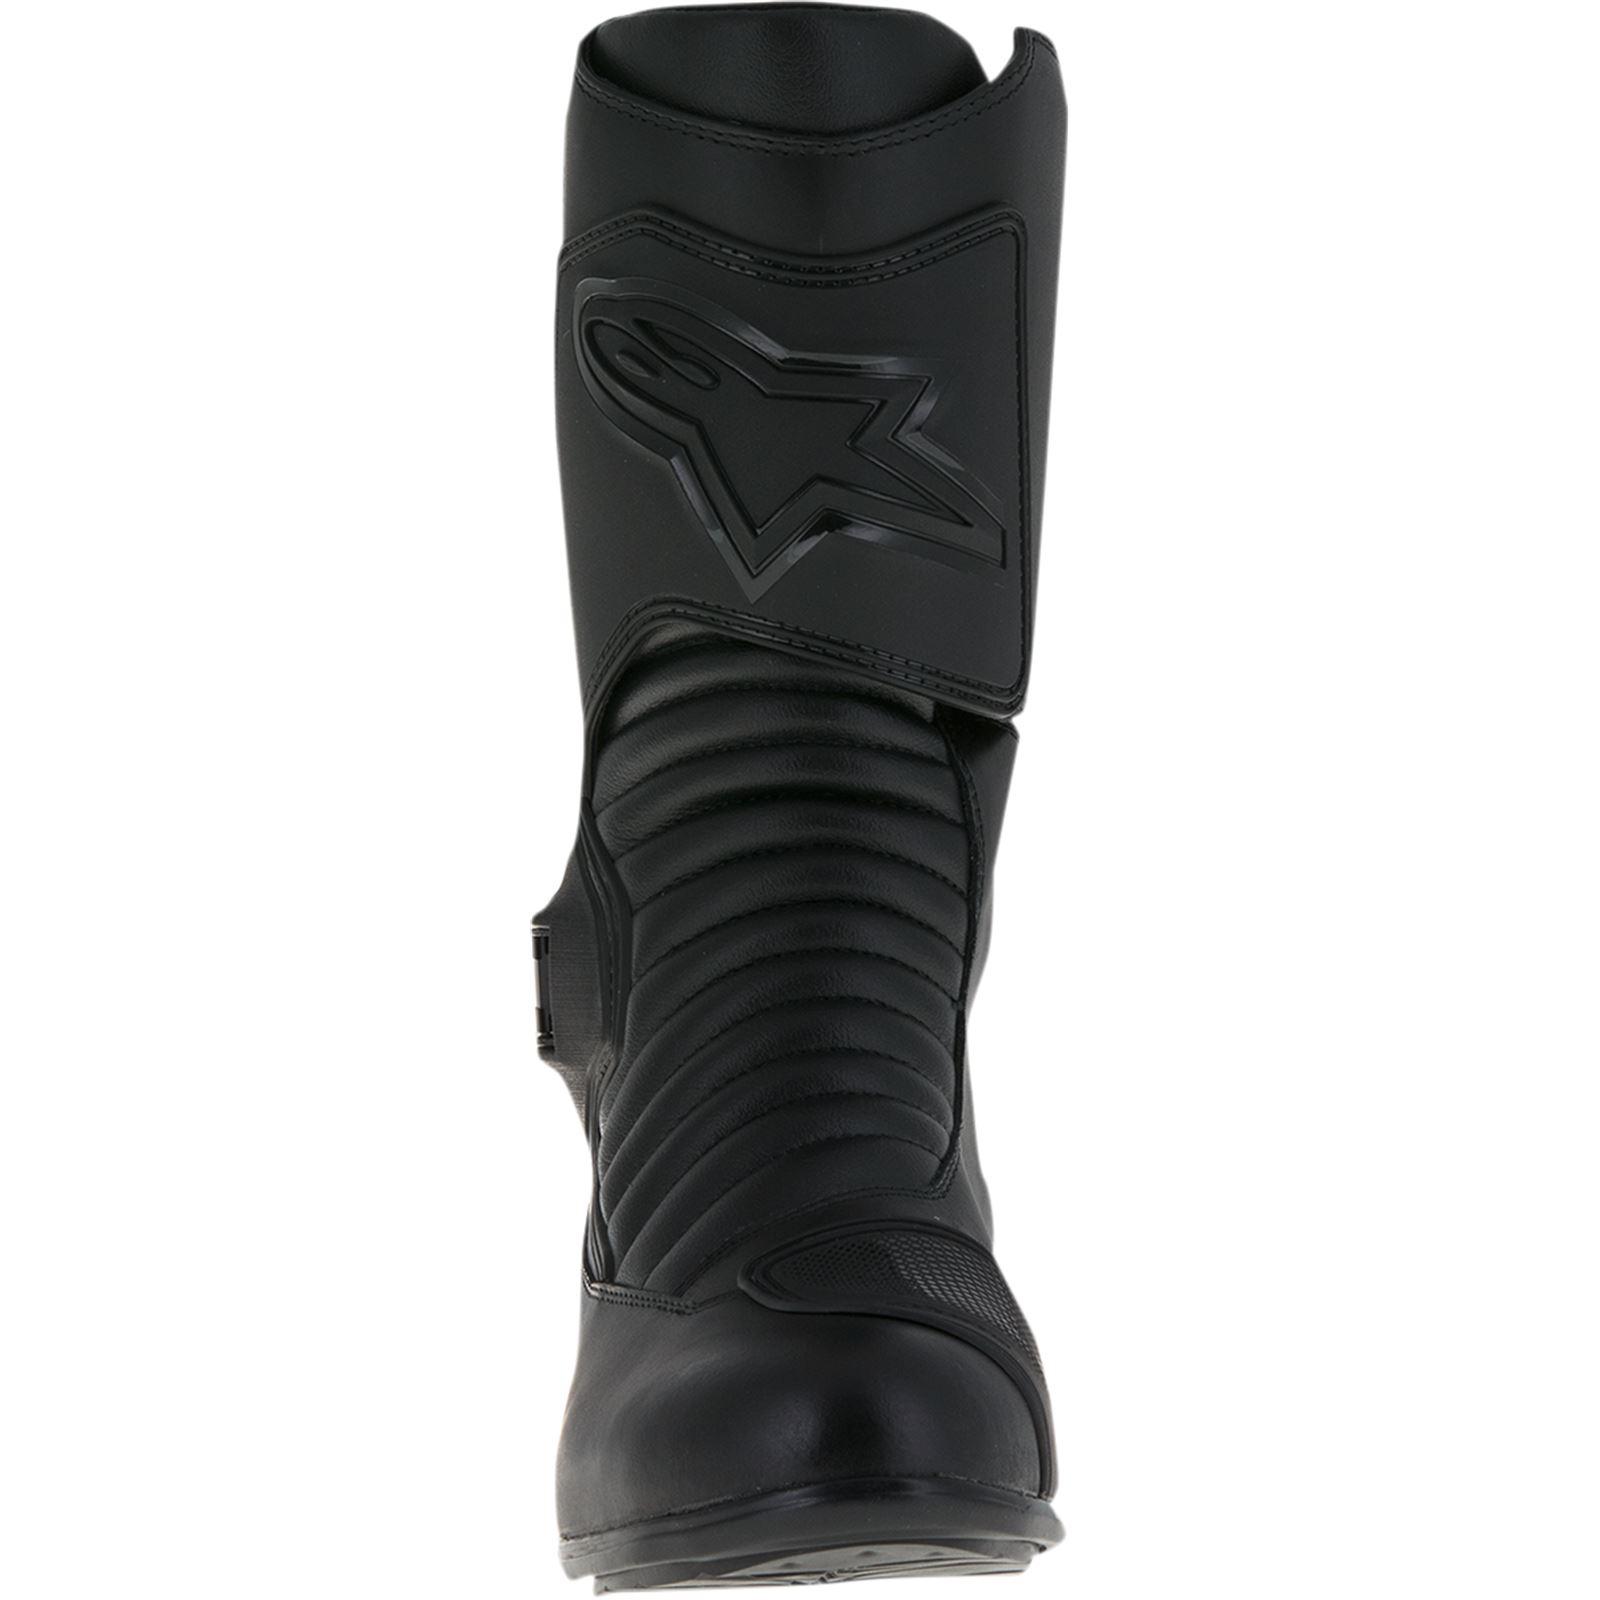 Alpinestars Supertouring Gore-Tex Boots - Black - Size 6.5